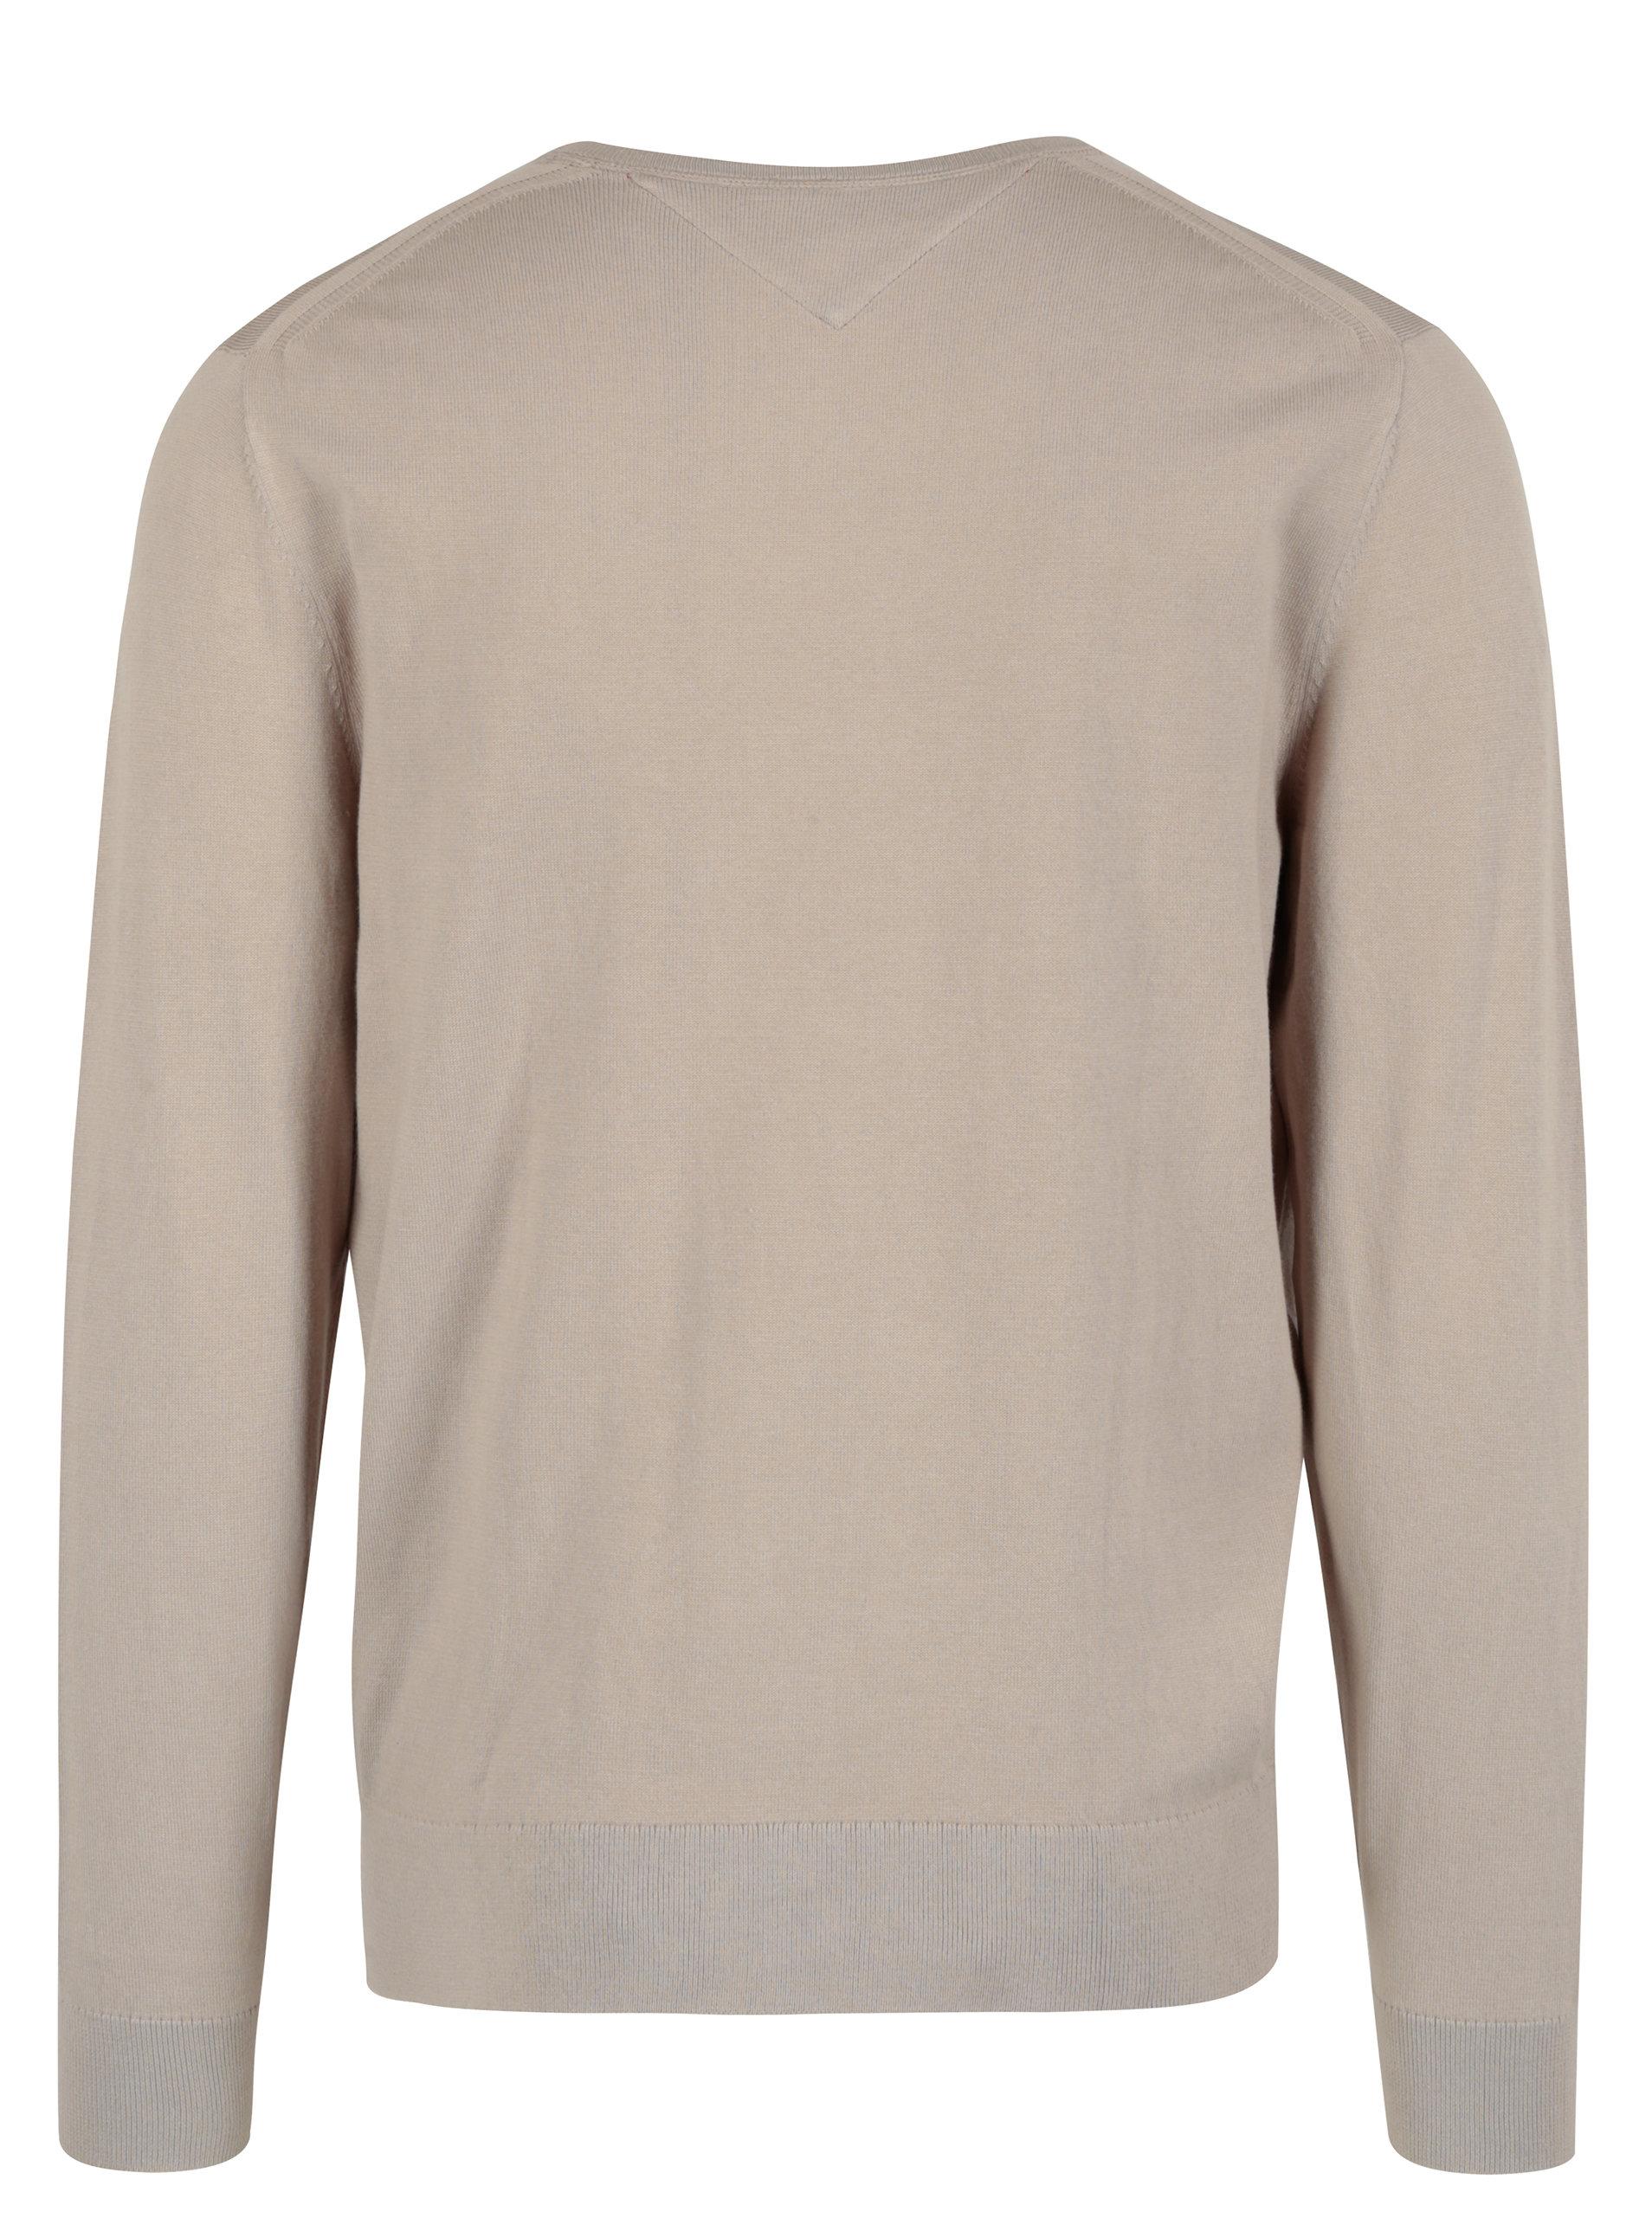 Béžový pánsky sveter Tommy Hilfiger Compact ... 308088ea353